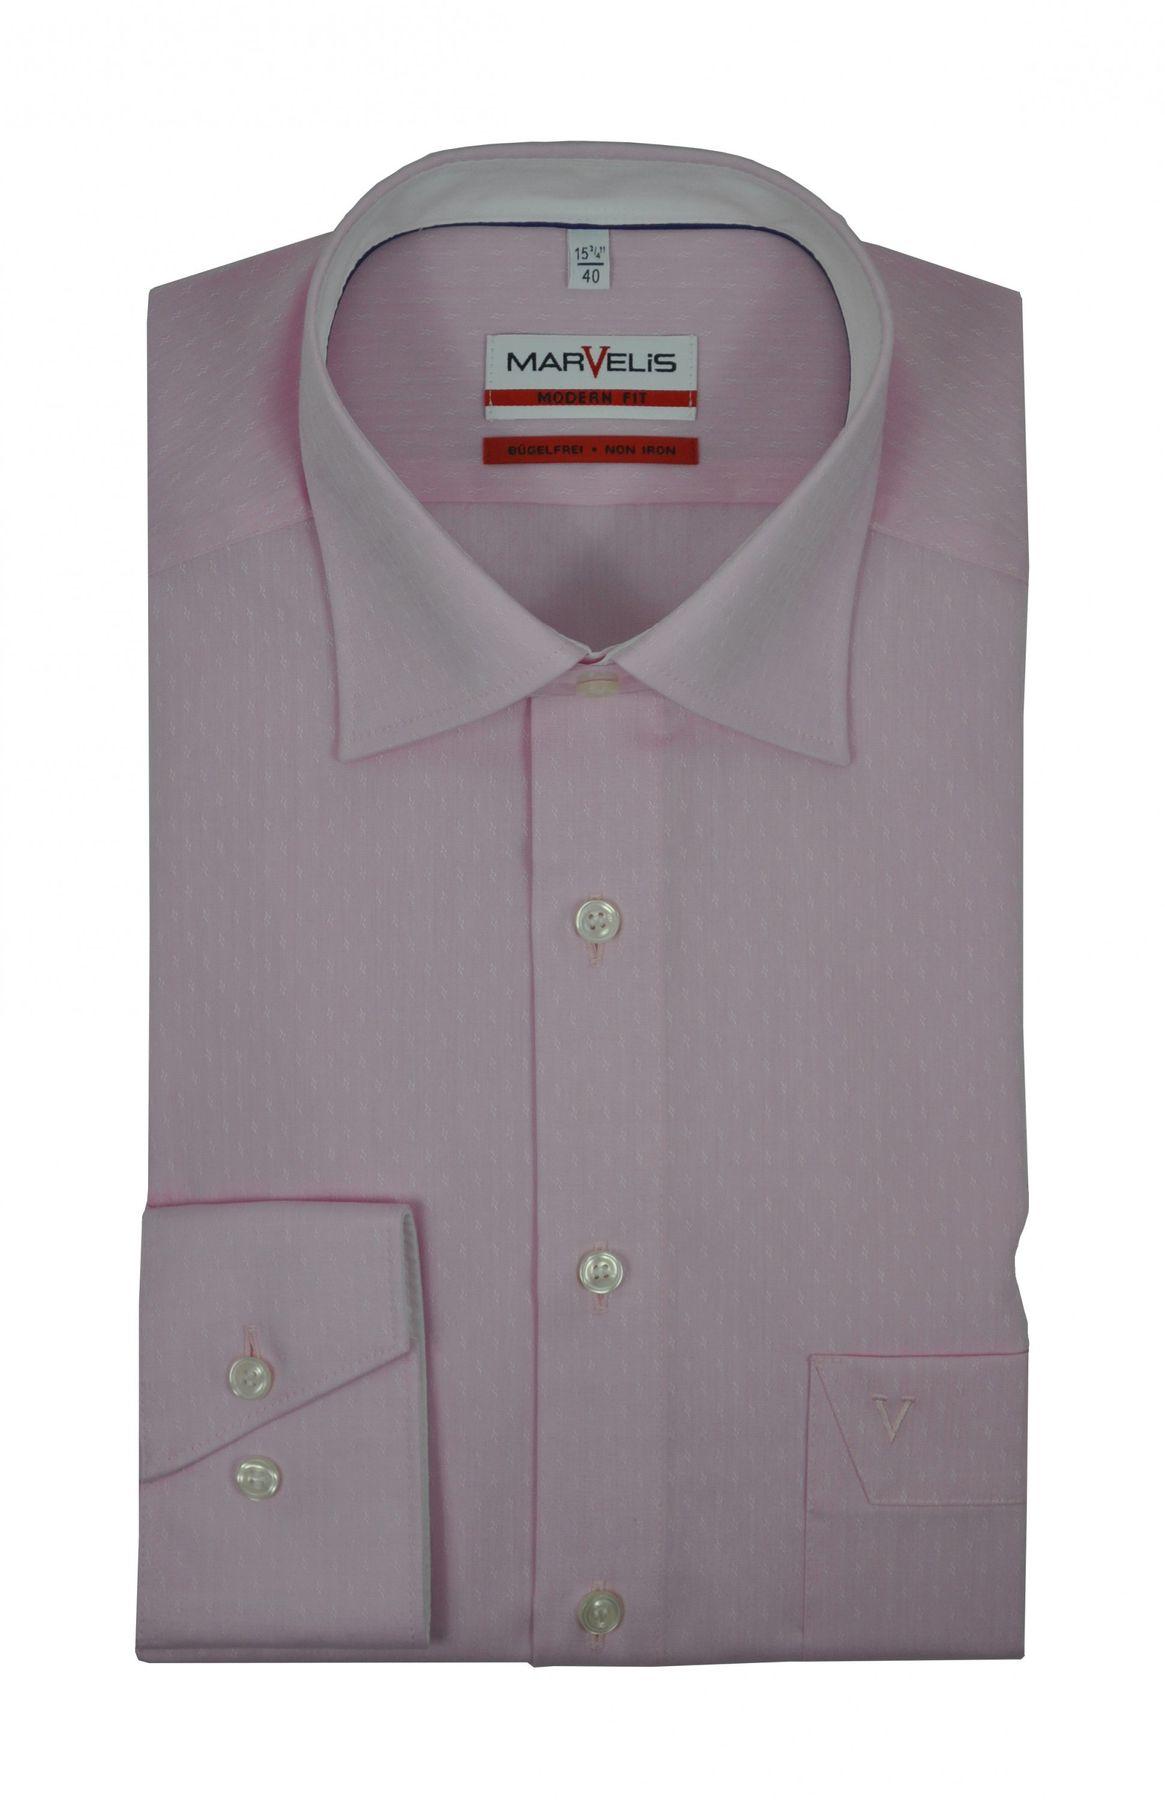 Marvelis - Modern Fit - Bügelfreies Herren Langarm Hemd in Rosa (7223/54)